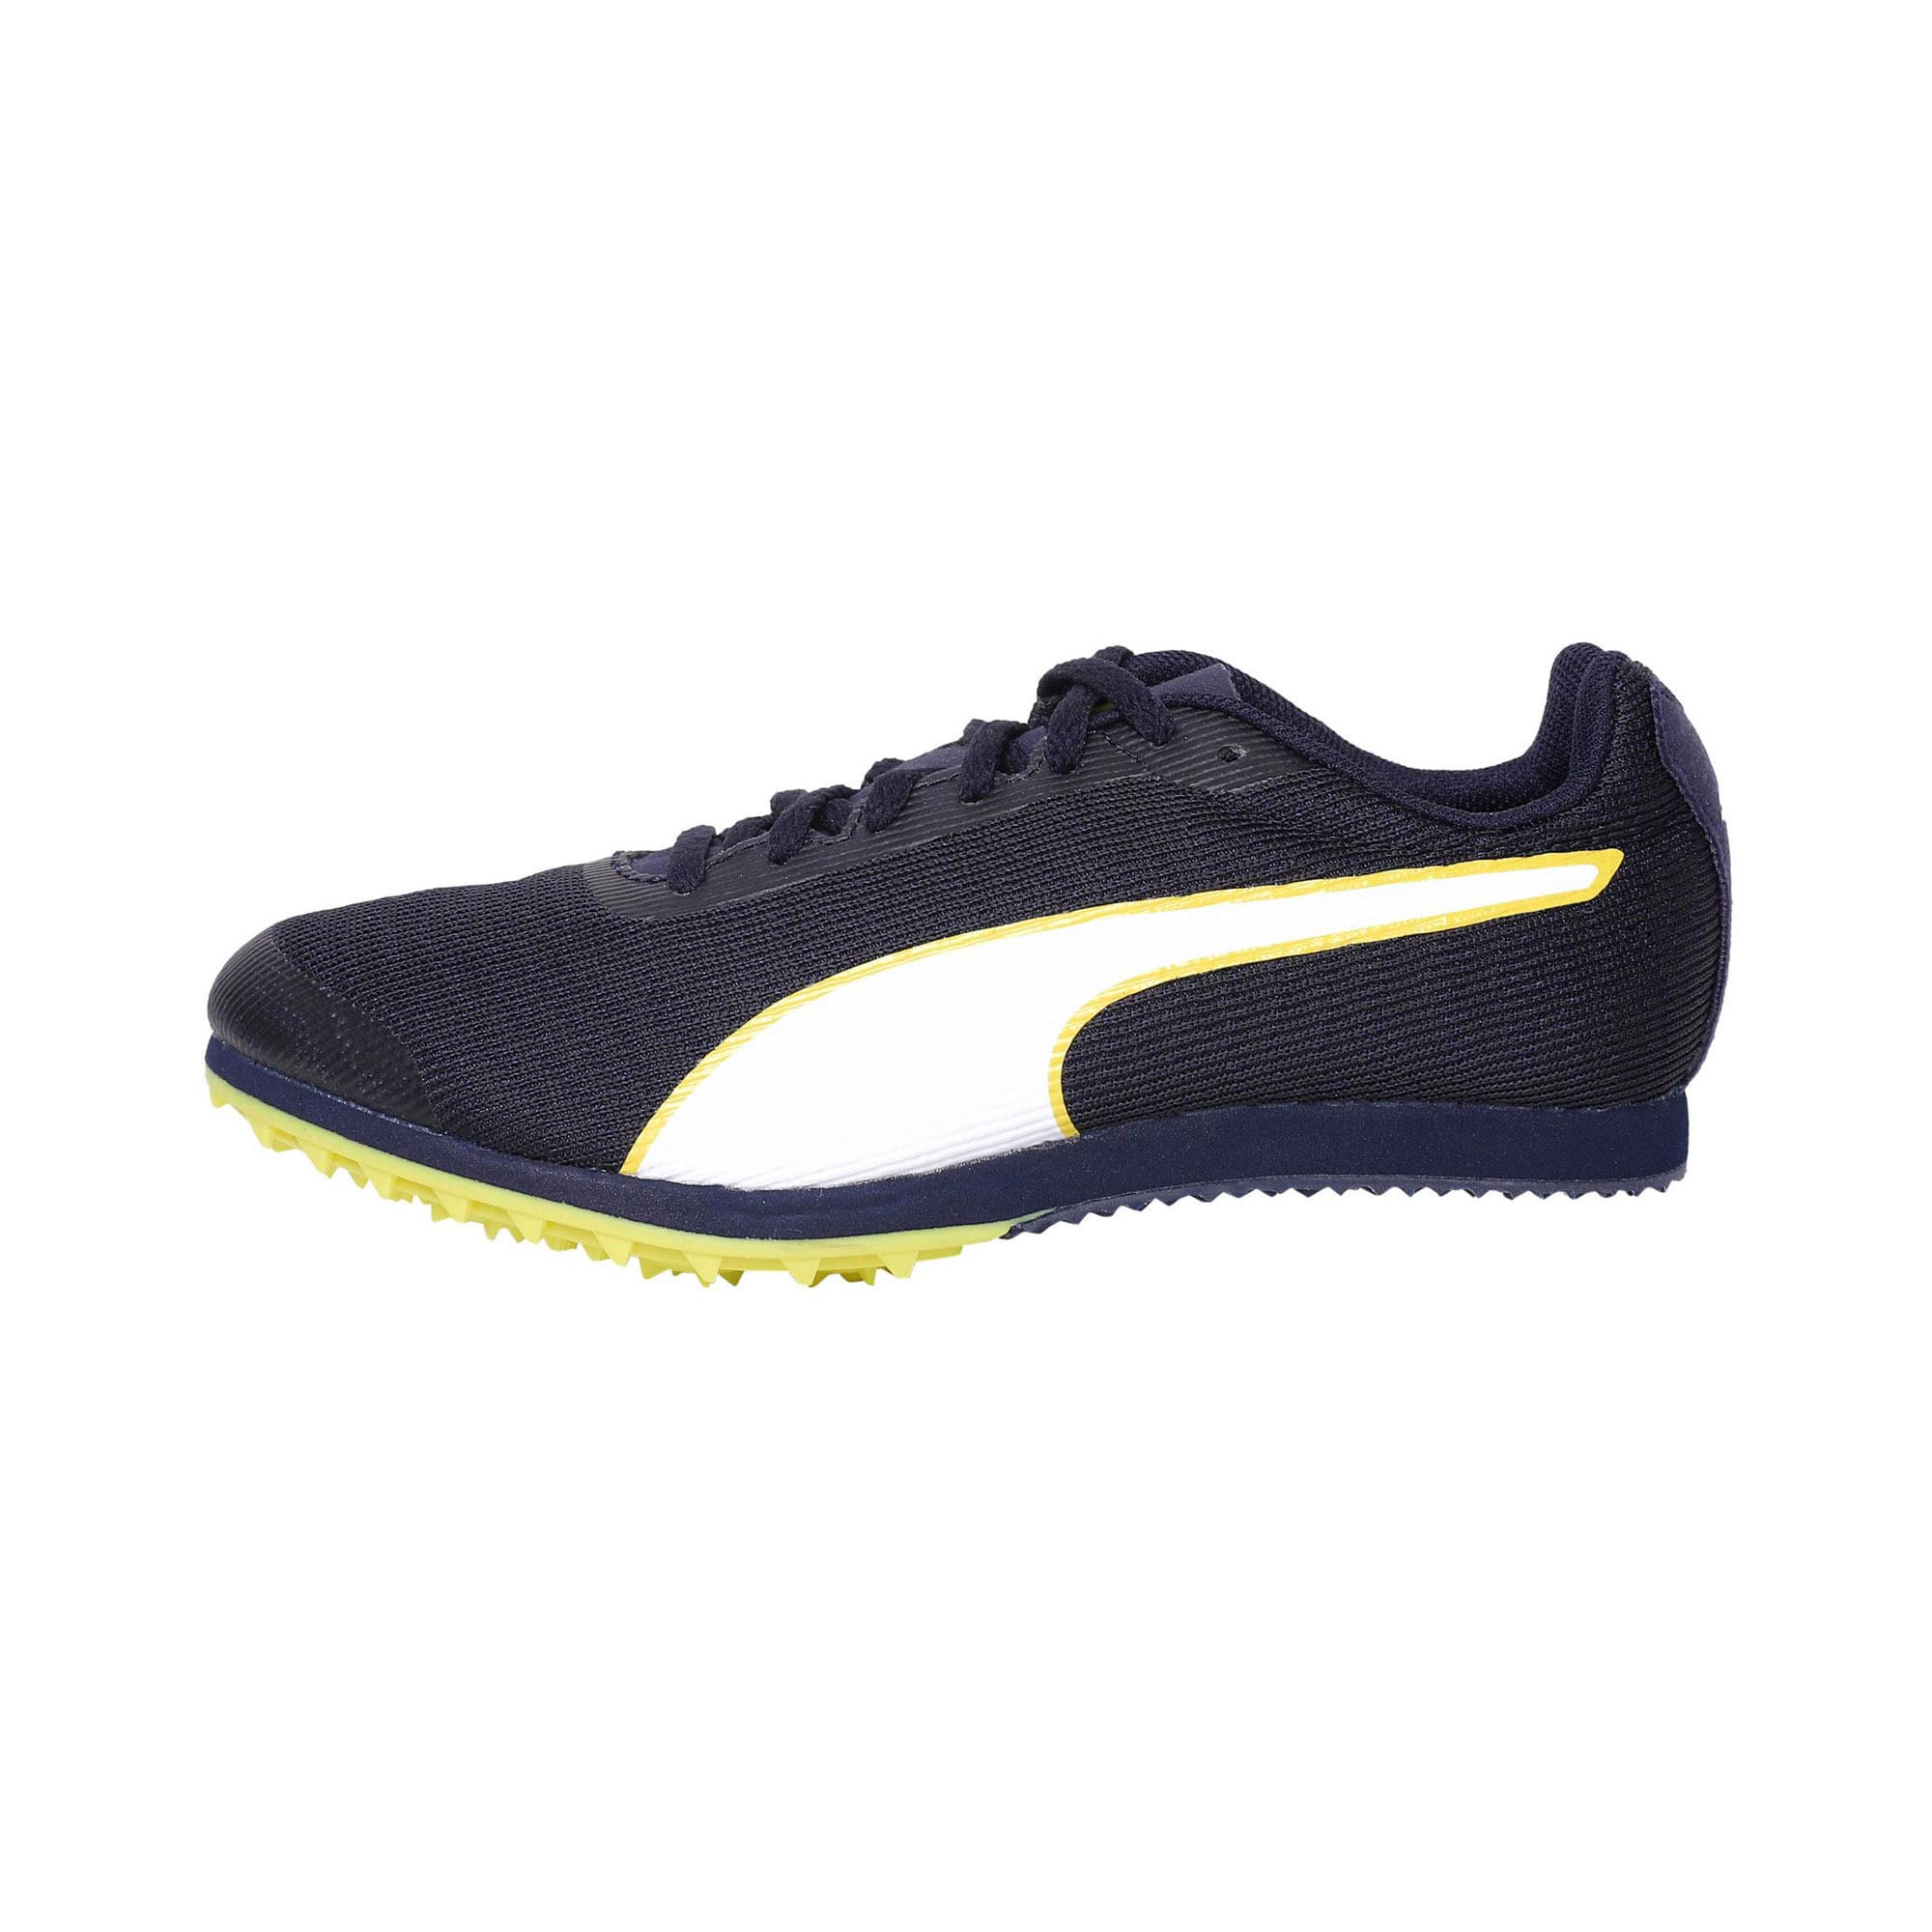 Thumbnail 1 of evoSPEED Star 6 Kids' Running Shoes, Peacoat-Puma Black-Yellow, medium-IND